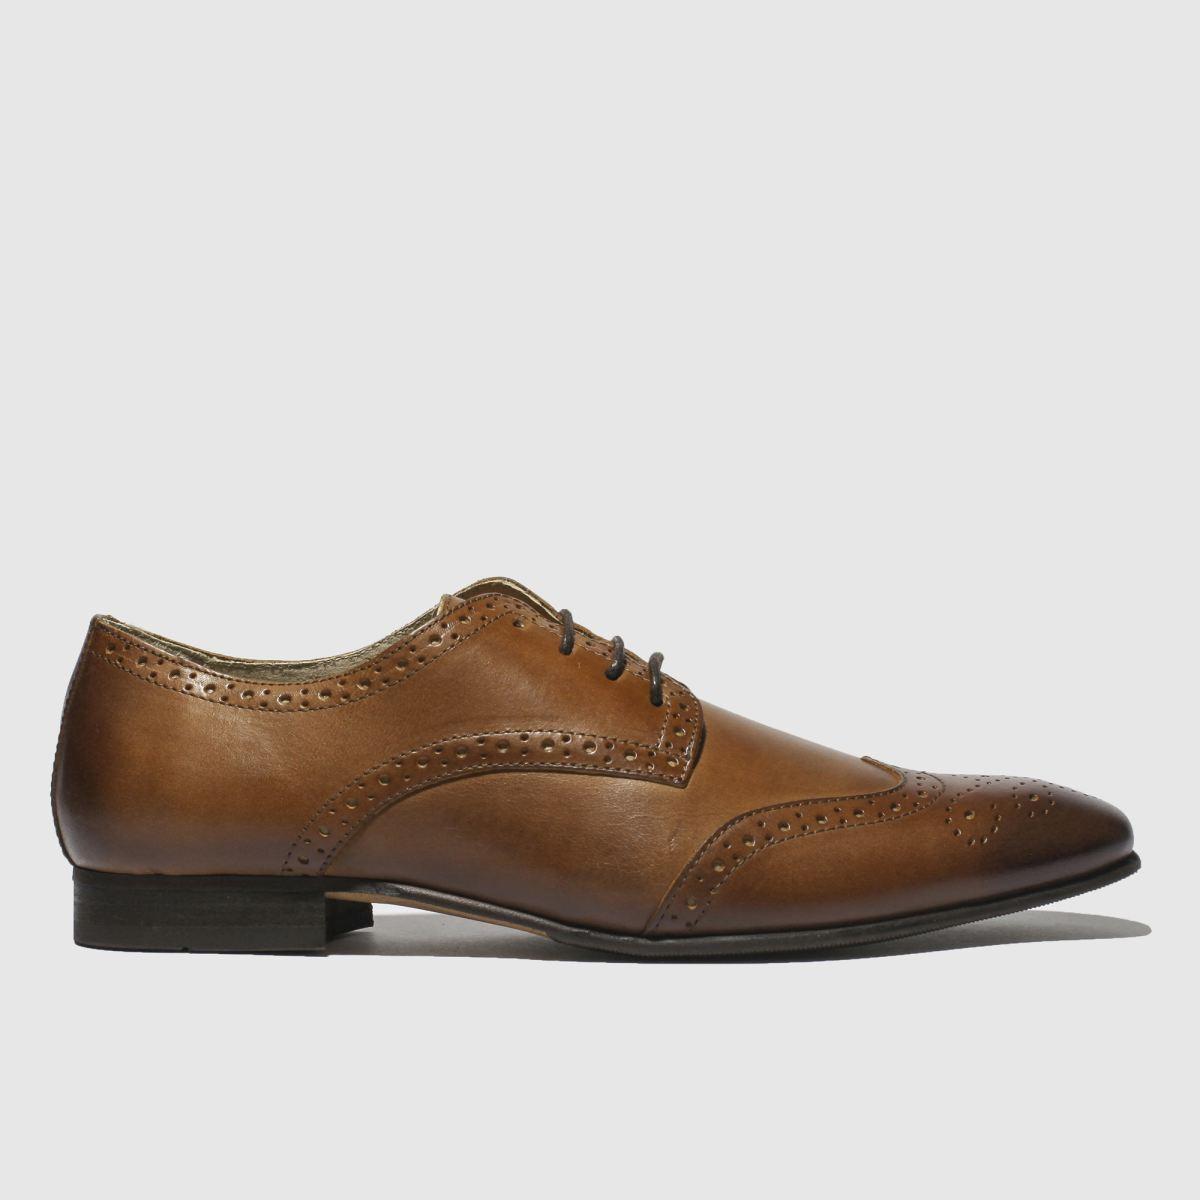 Schuh Tan Robinson Brogue Shoes